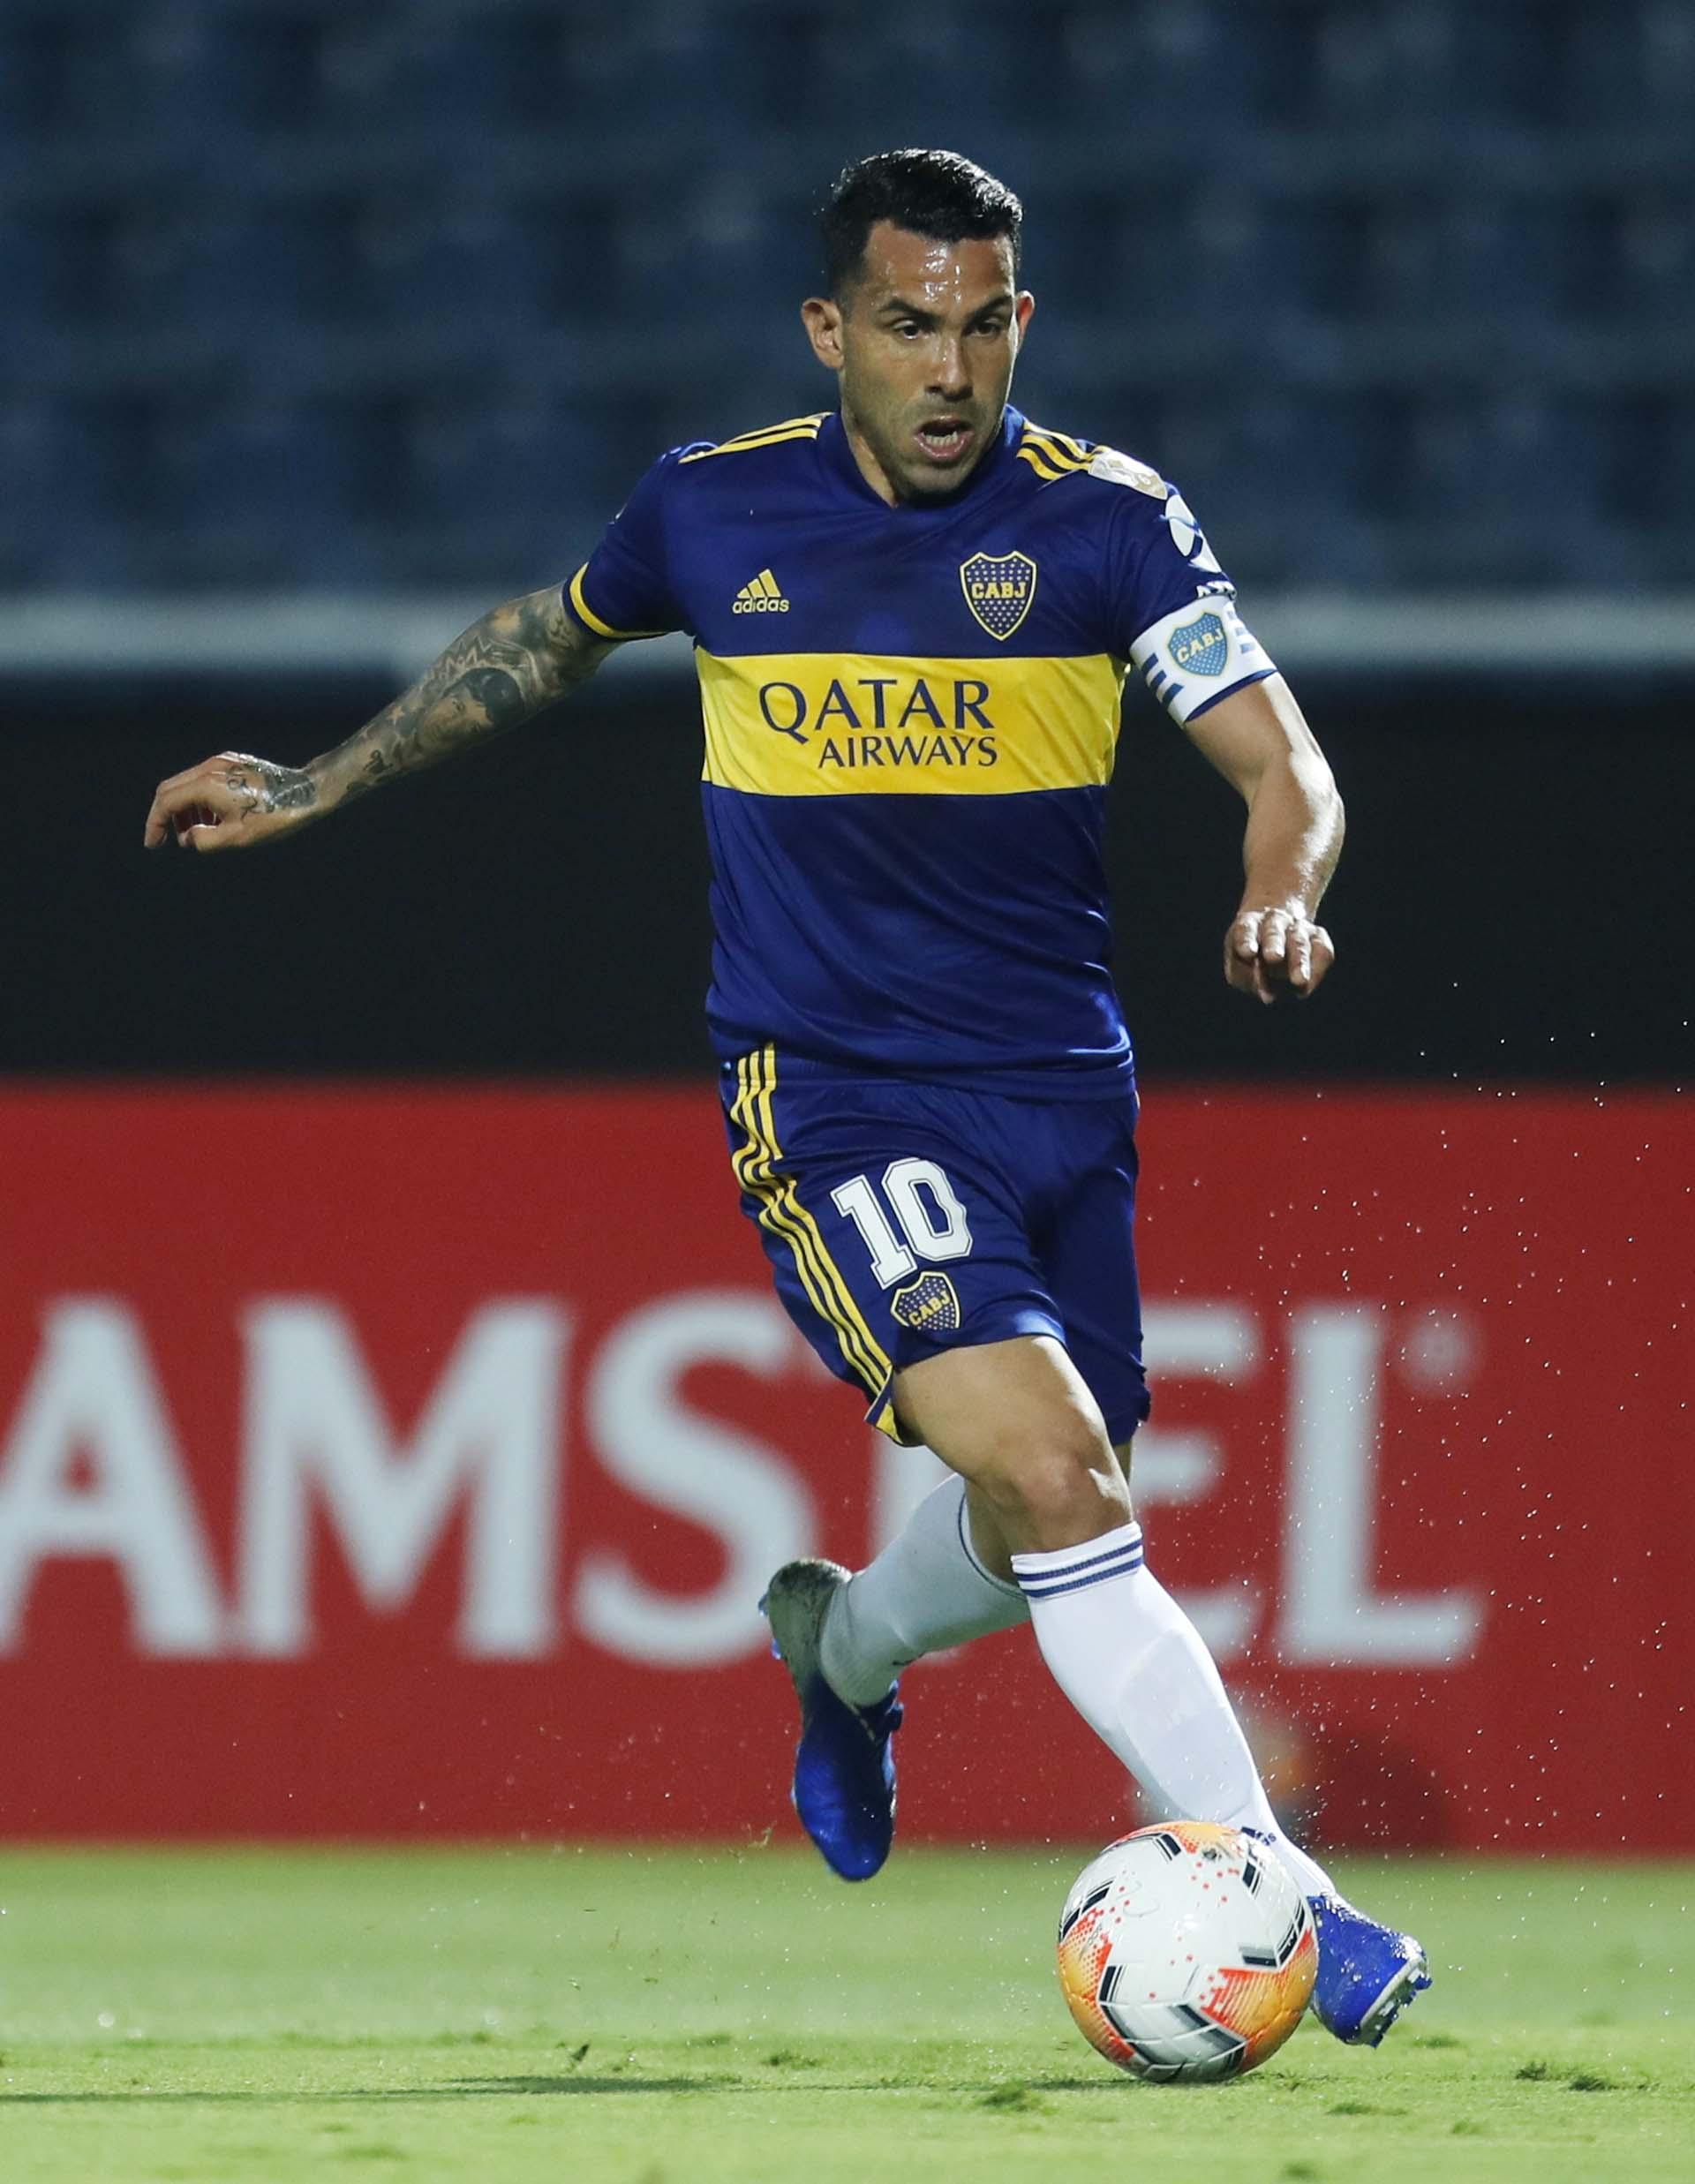 Tevez, capitán de Boca en el reinicio de la Copa Libertadores (REUTERS/Jorge Saenz)